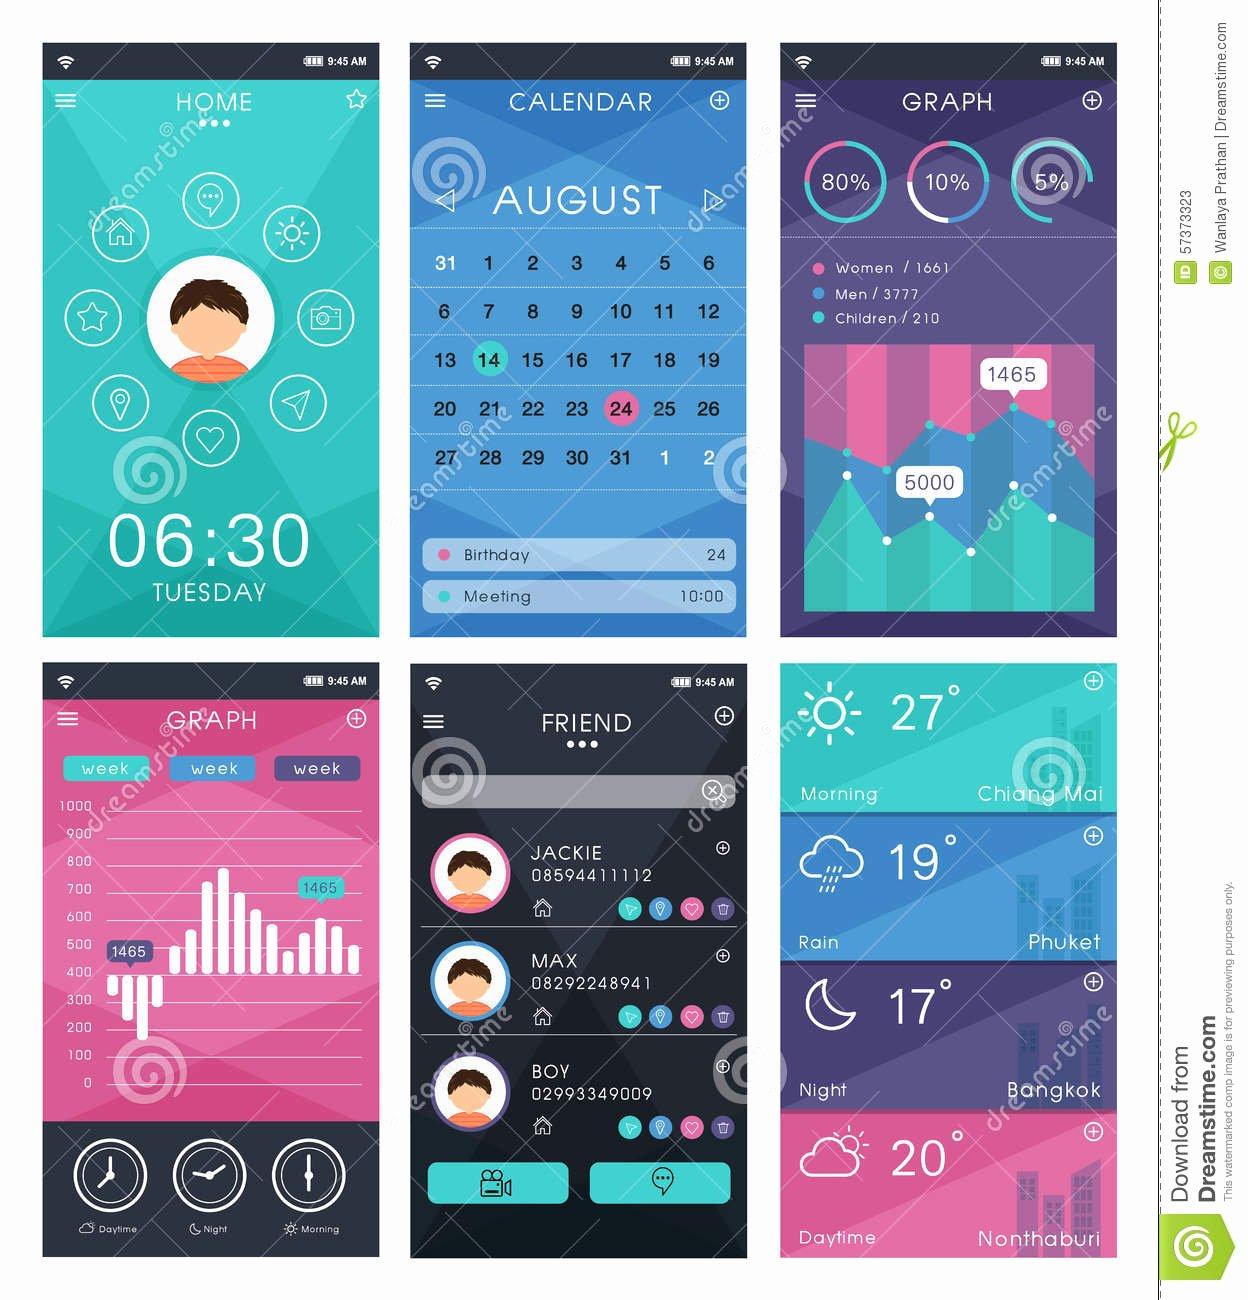 Mobile Apps Design Template Unique Template for Mobile App Design Stock Vector Illustration